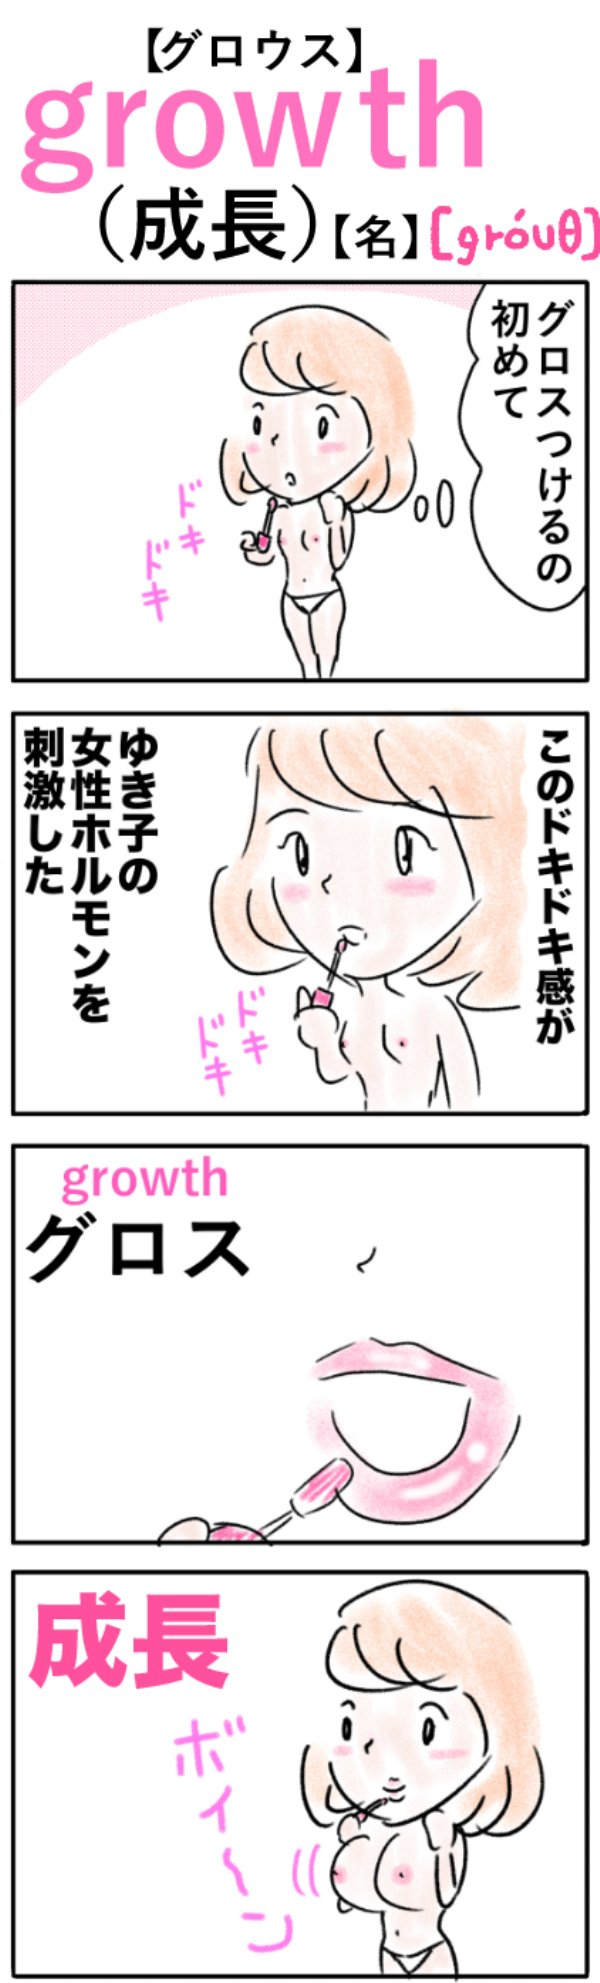 growth(成長)の語呂合わせ英単語